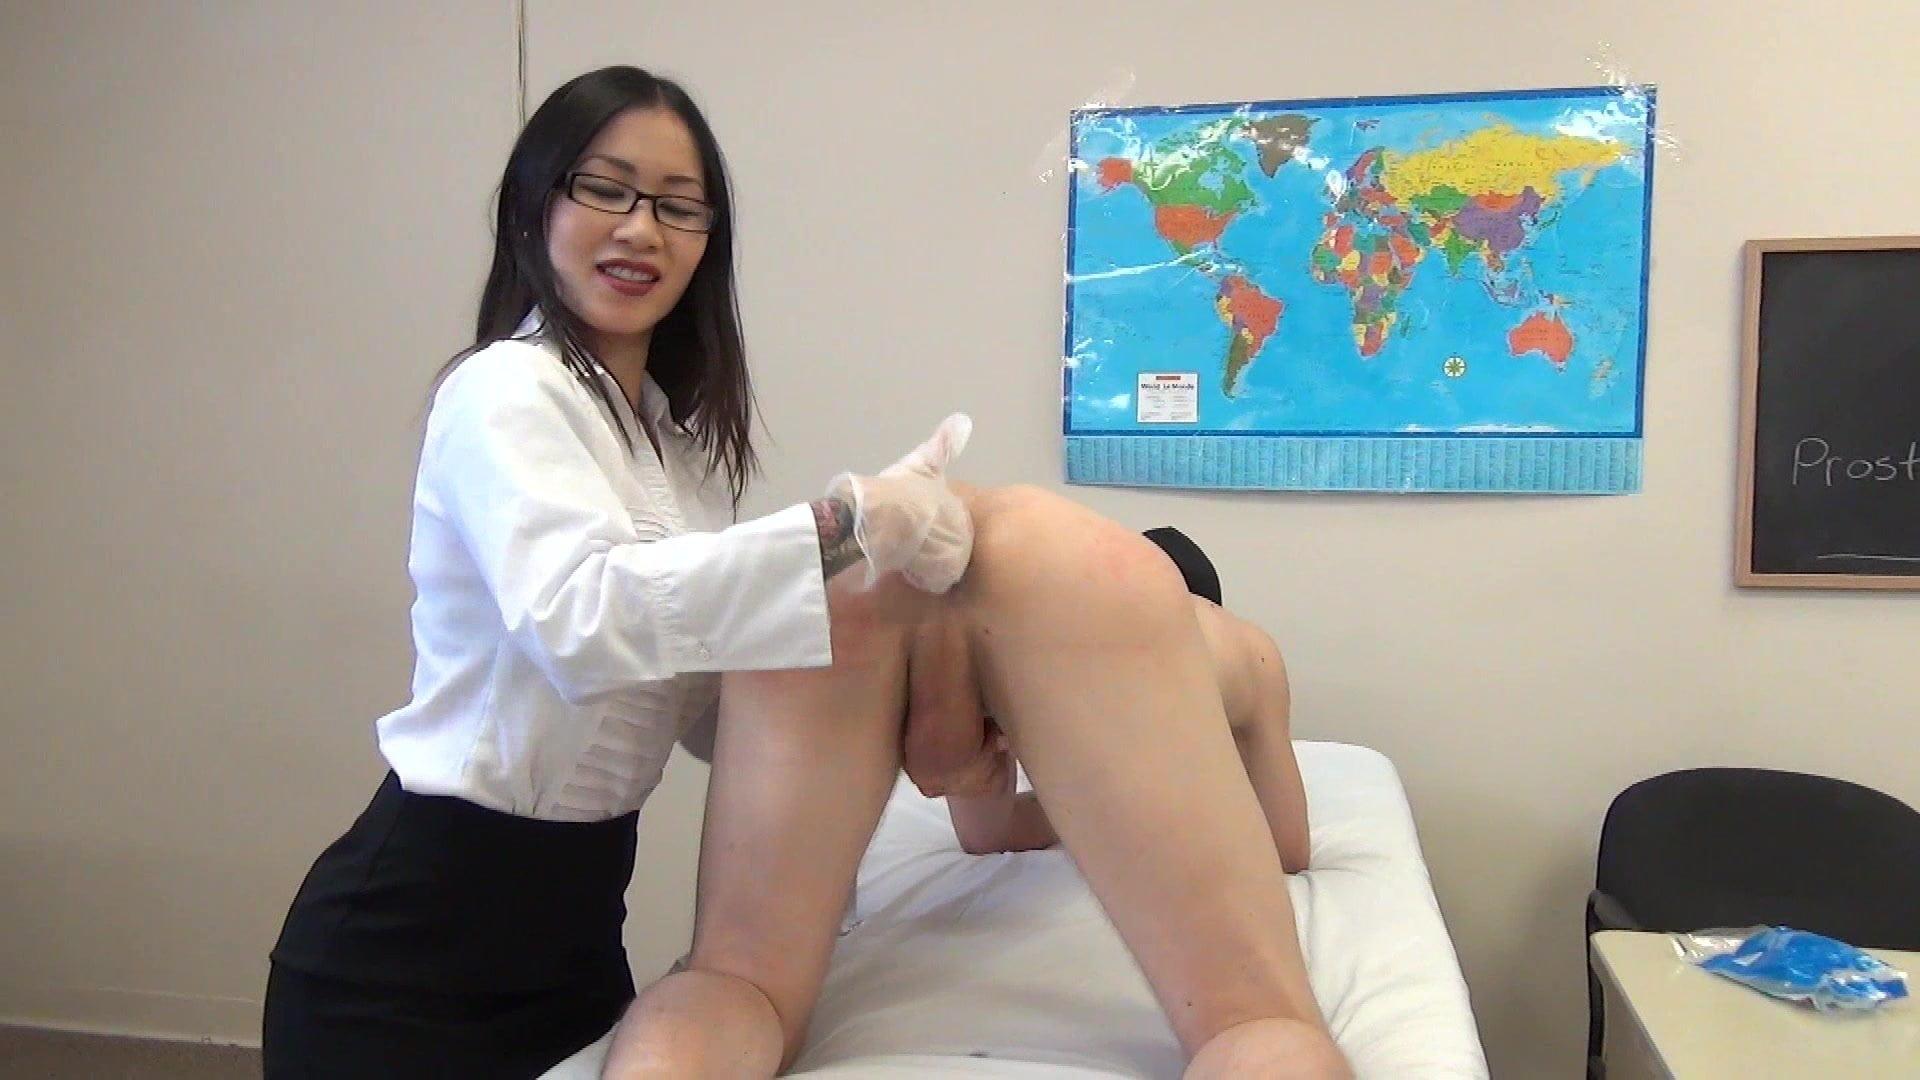 Prostate massage porn